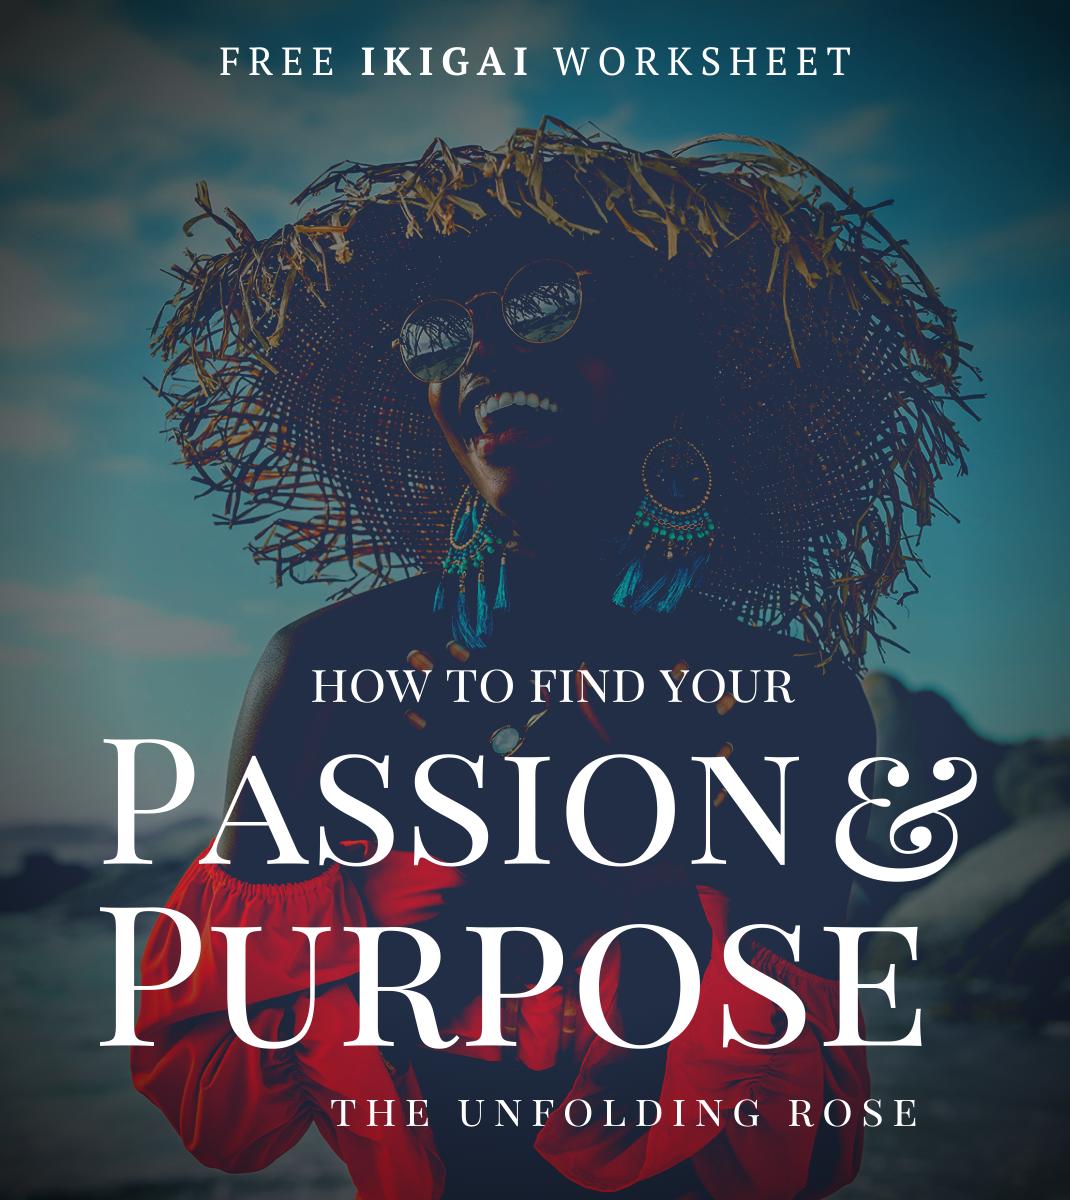 Find Your Purpose Worksheet Image